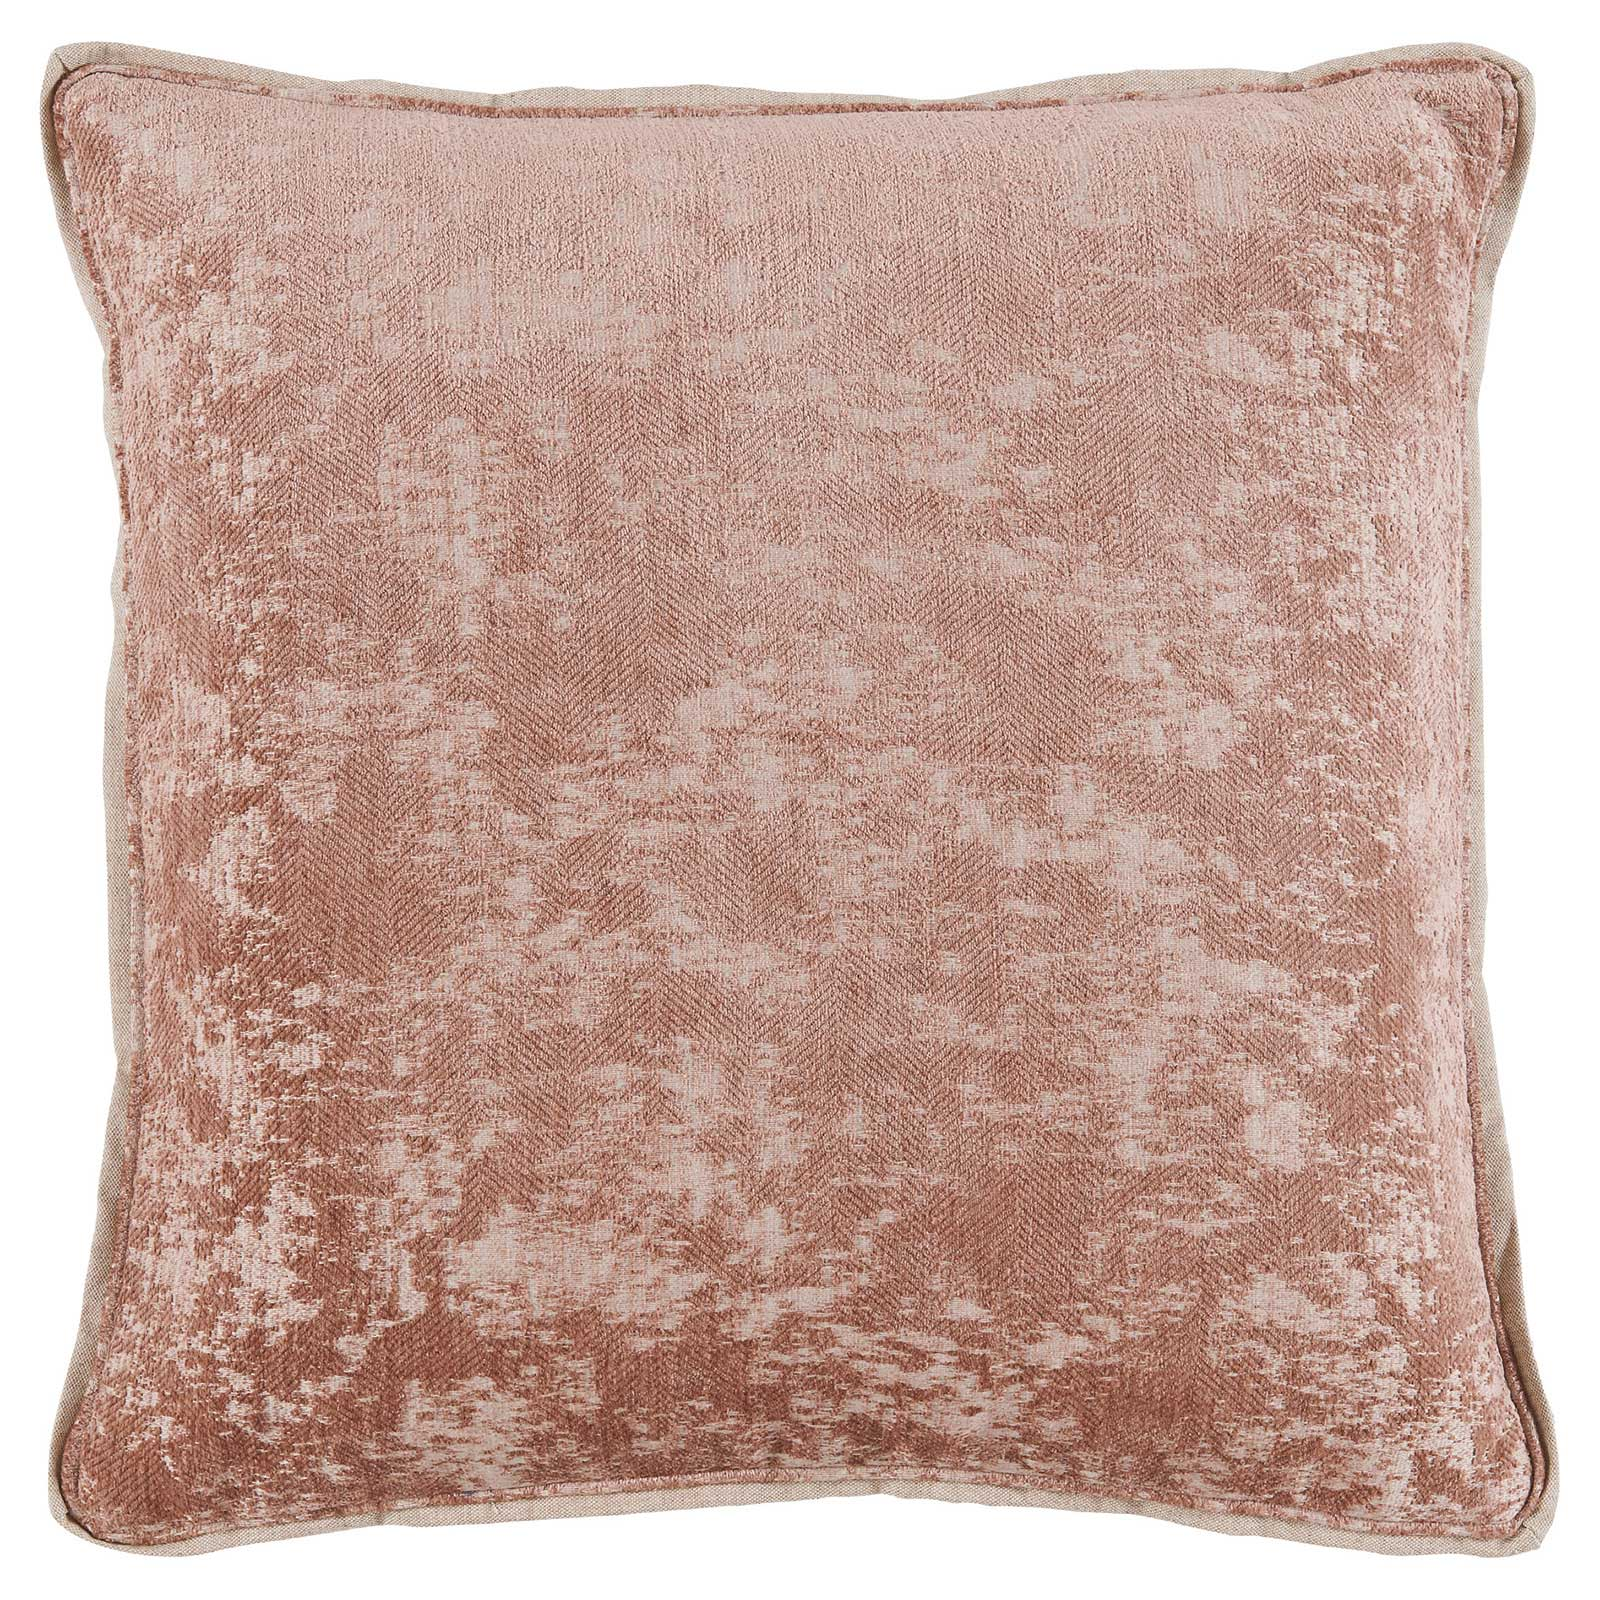 Harriet Regency Washed Herringbone Rose Pillow - 22x22